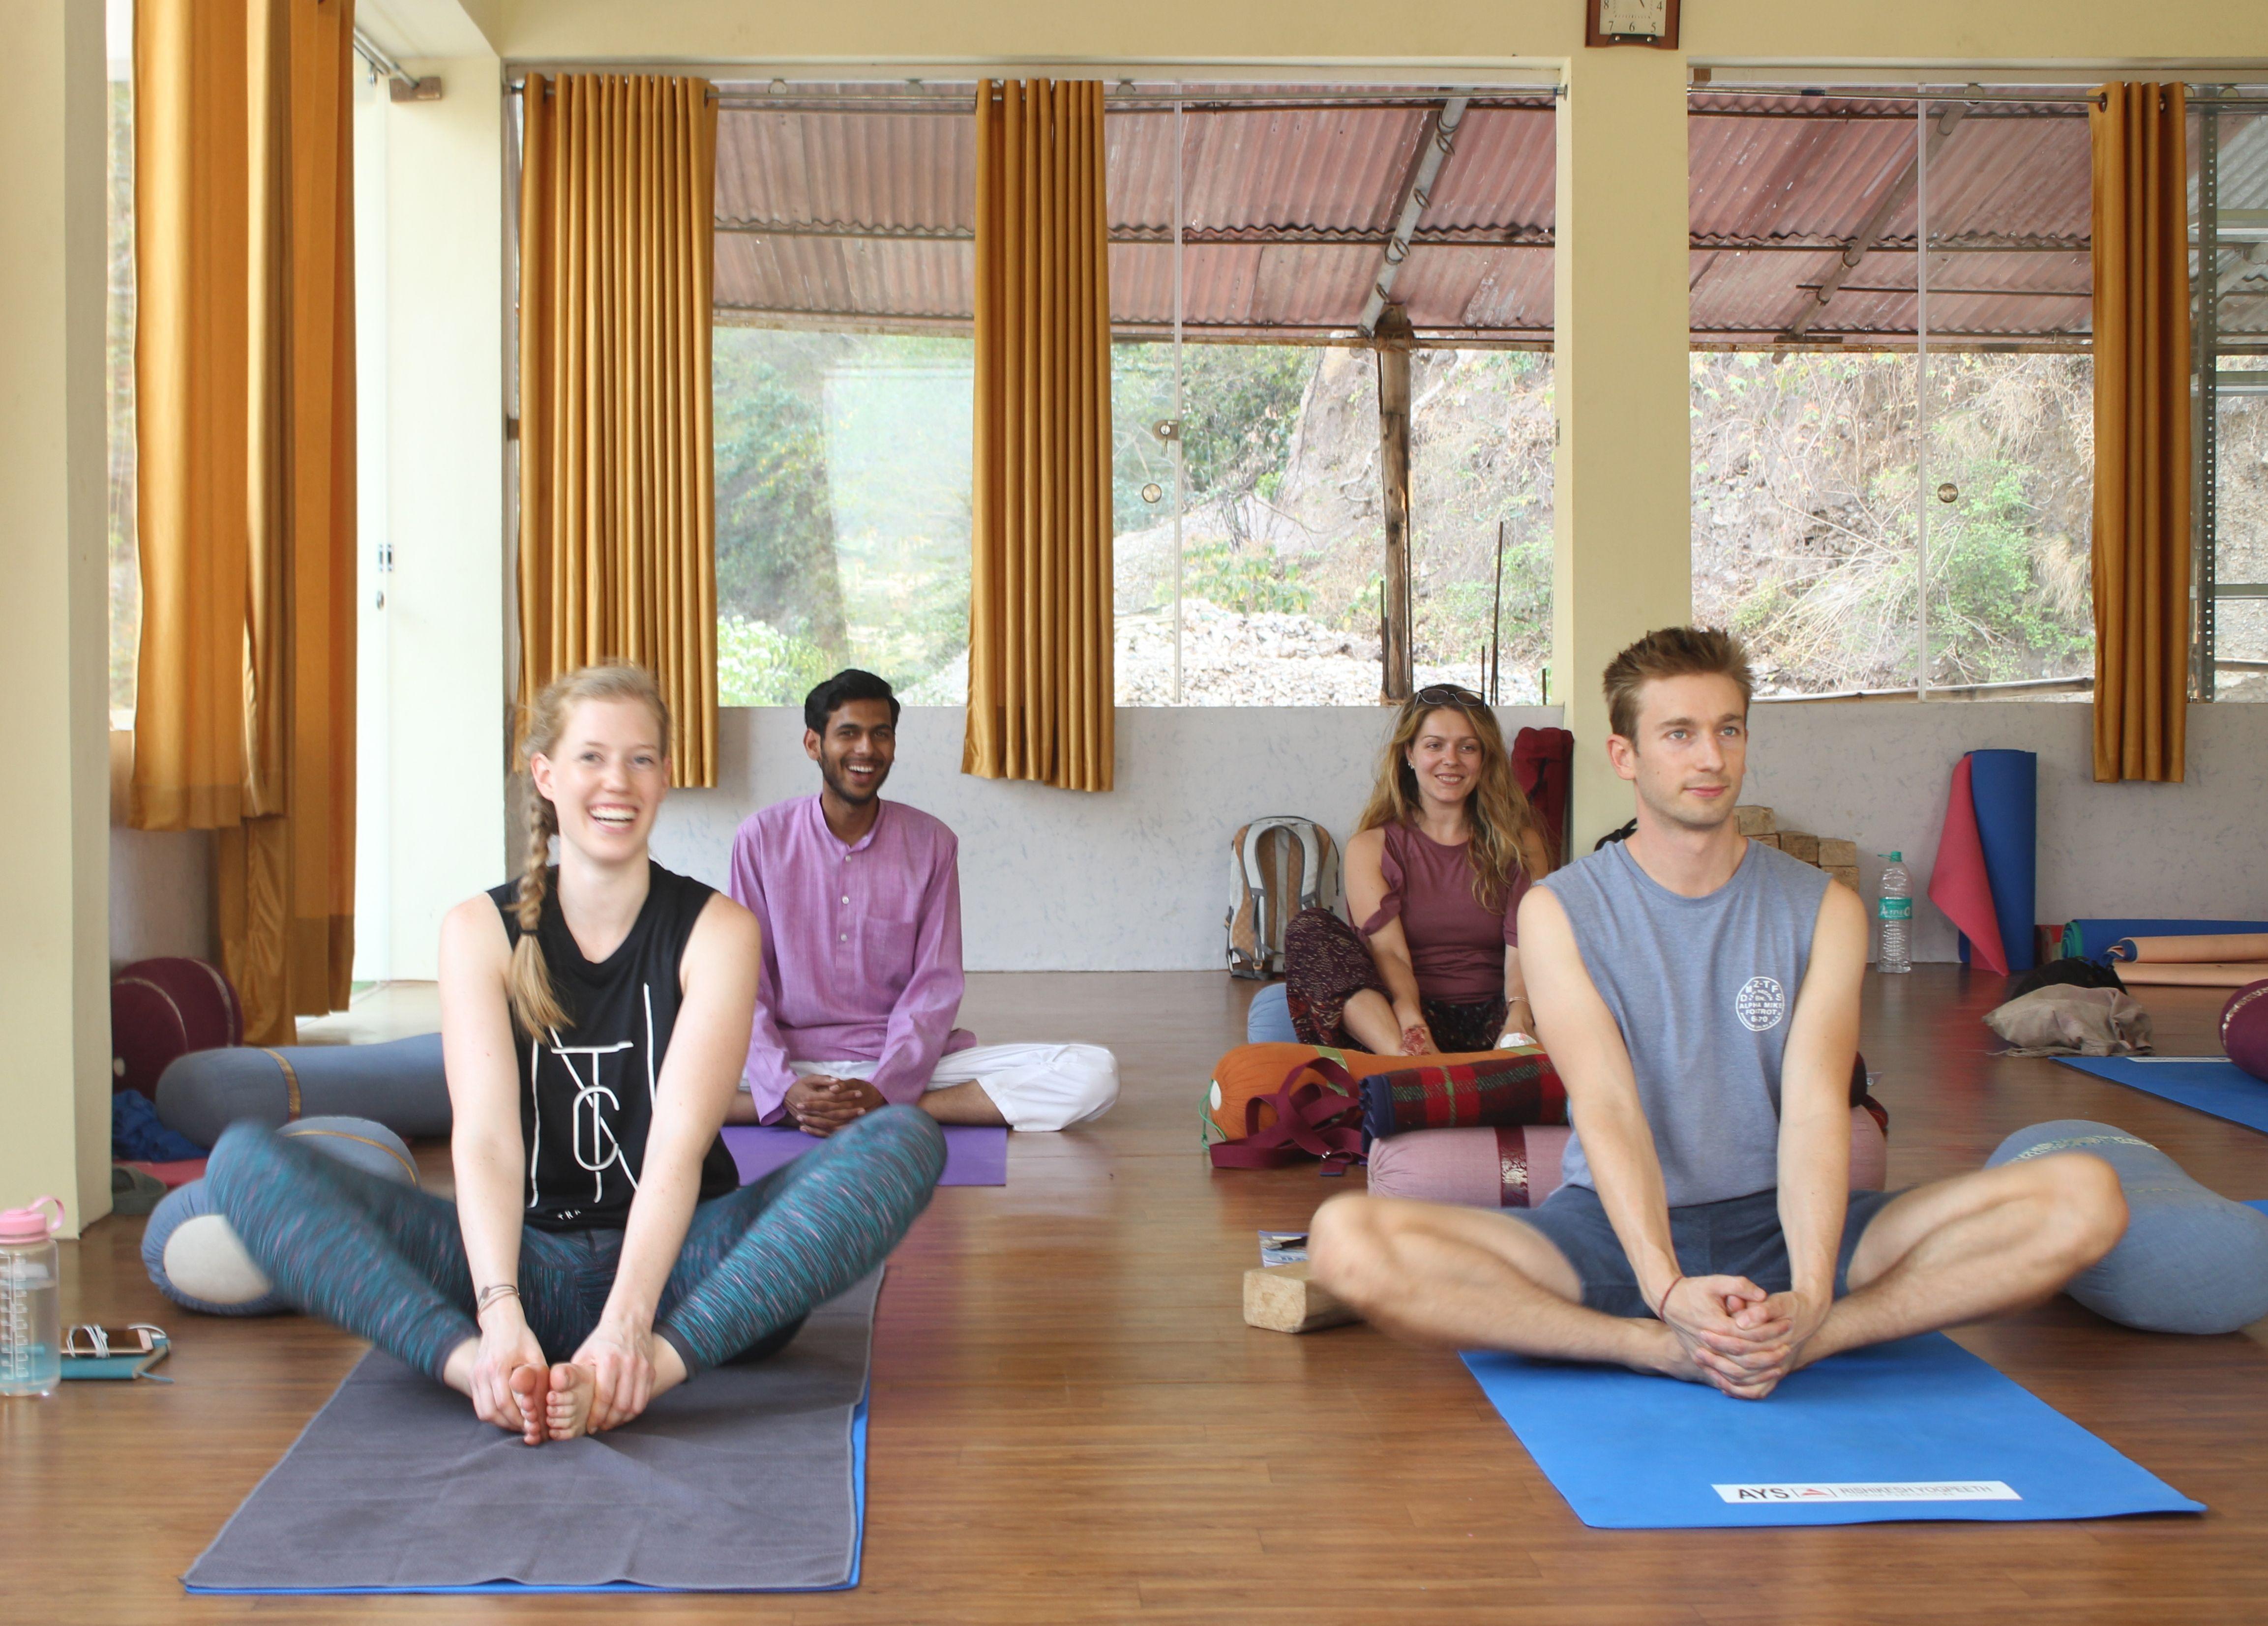 200 Hour Ashtanga Yoga Teacher Training In India 200 Hour Yoga Teacher Training India Yoga Teacher Training India Yoga Yoga Teacher Training